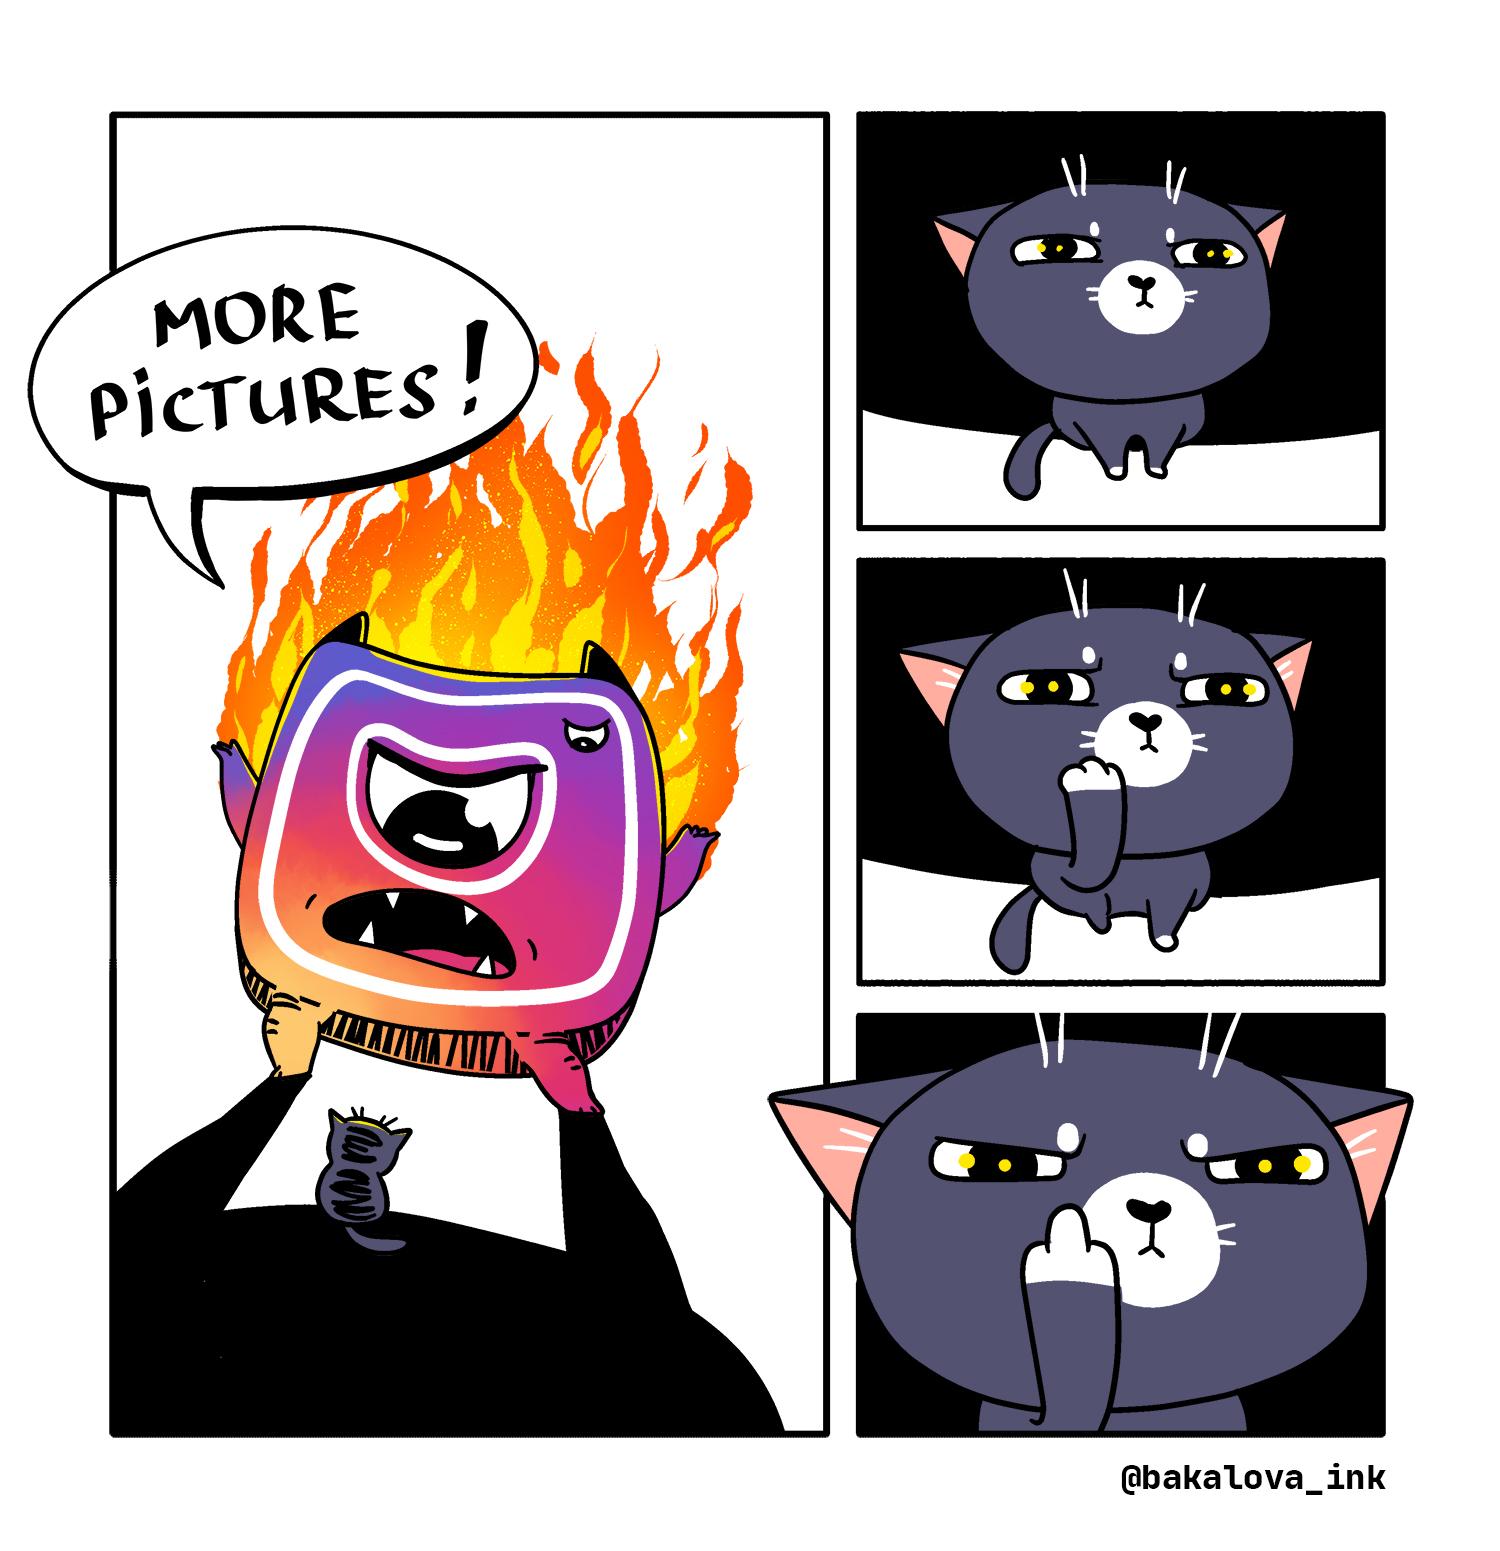 insta monster comic